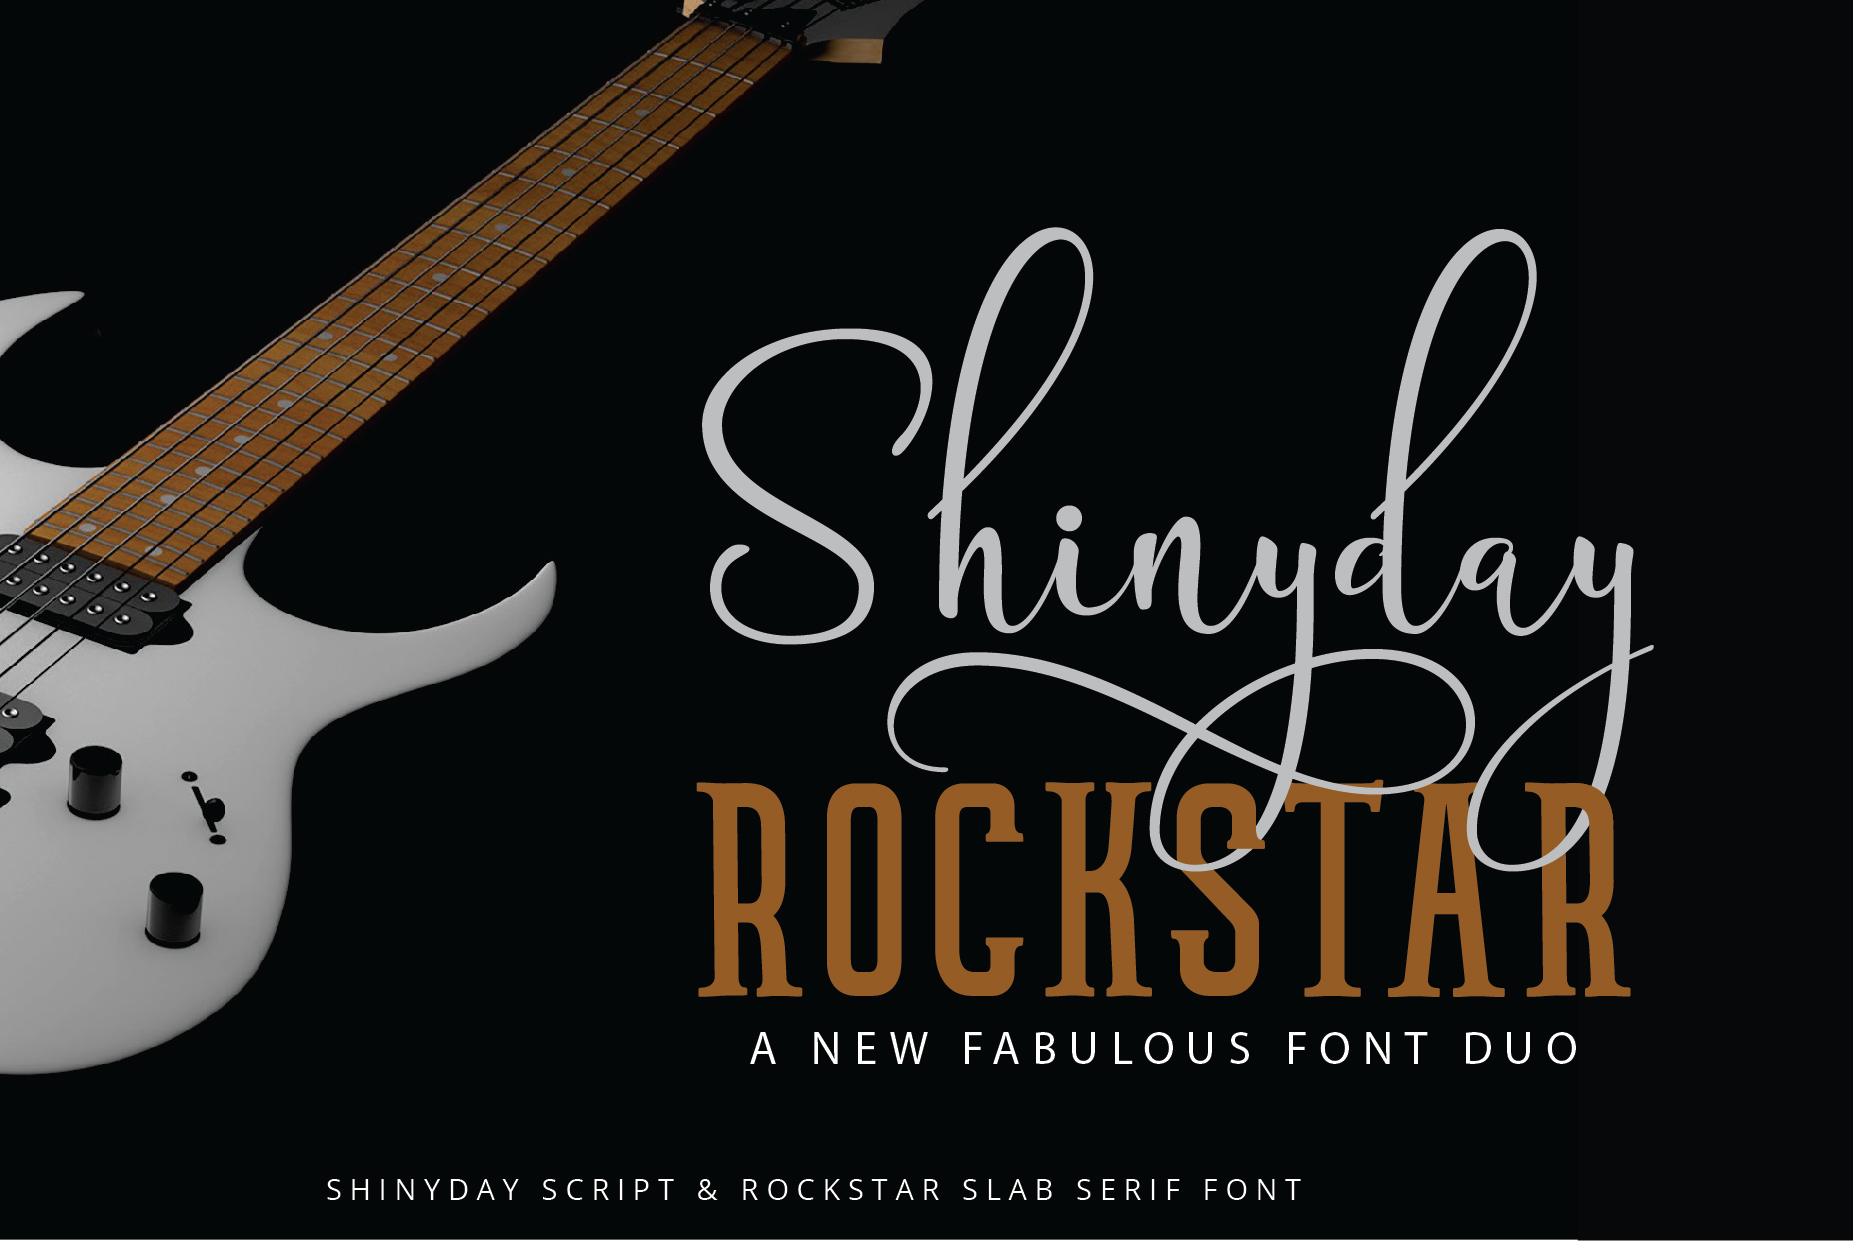 Shinyday Rockstar Font Demo